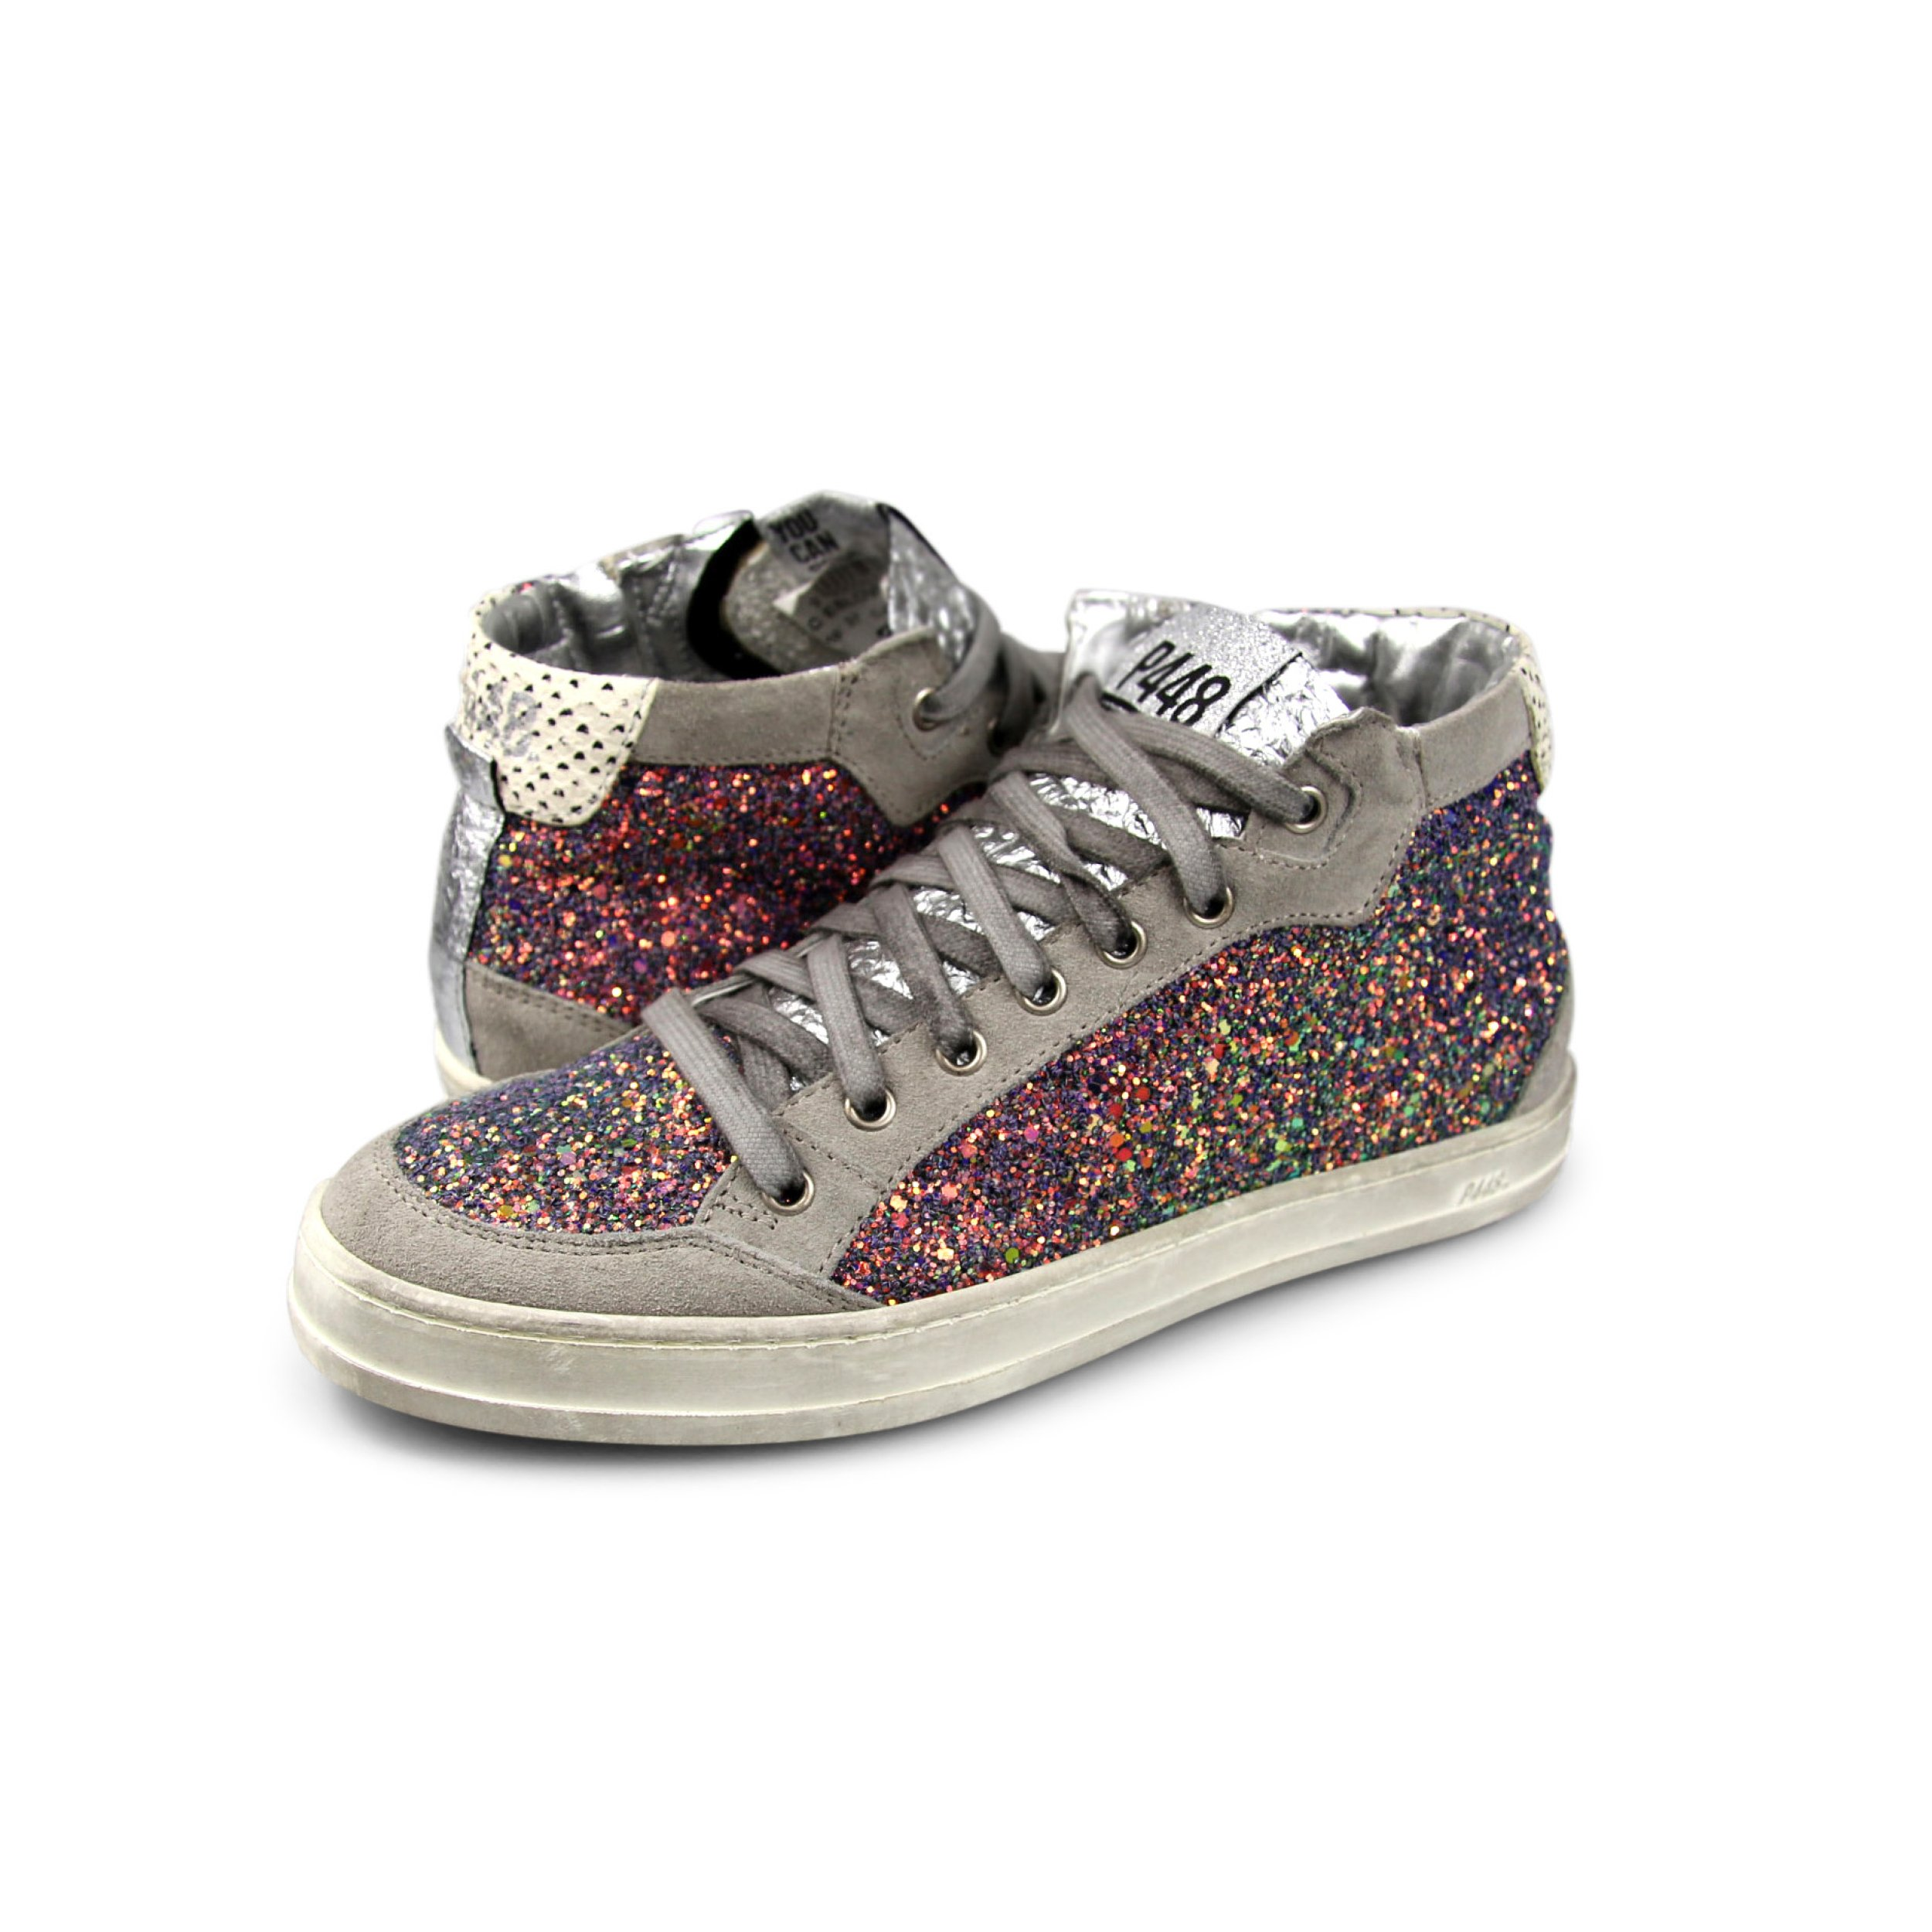 P448 Women's Love Italian Leather Multicolor Glitter Sneaker EU 39 - US 8/8.5